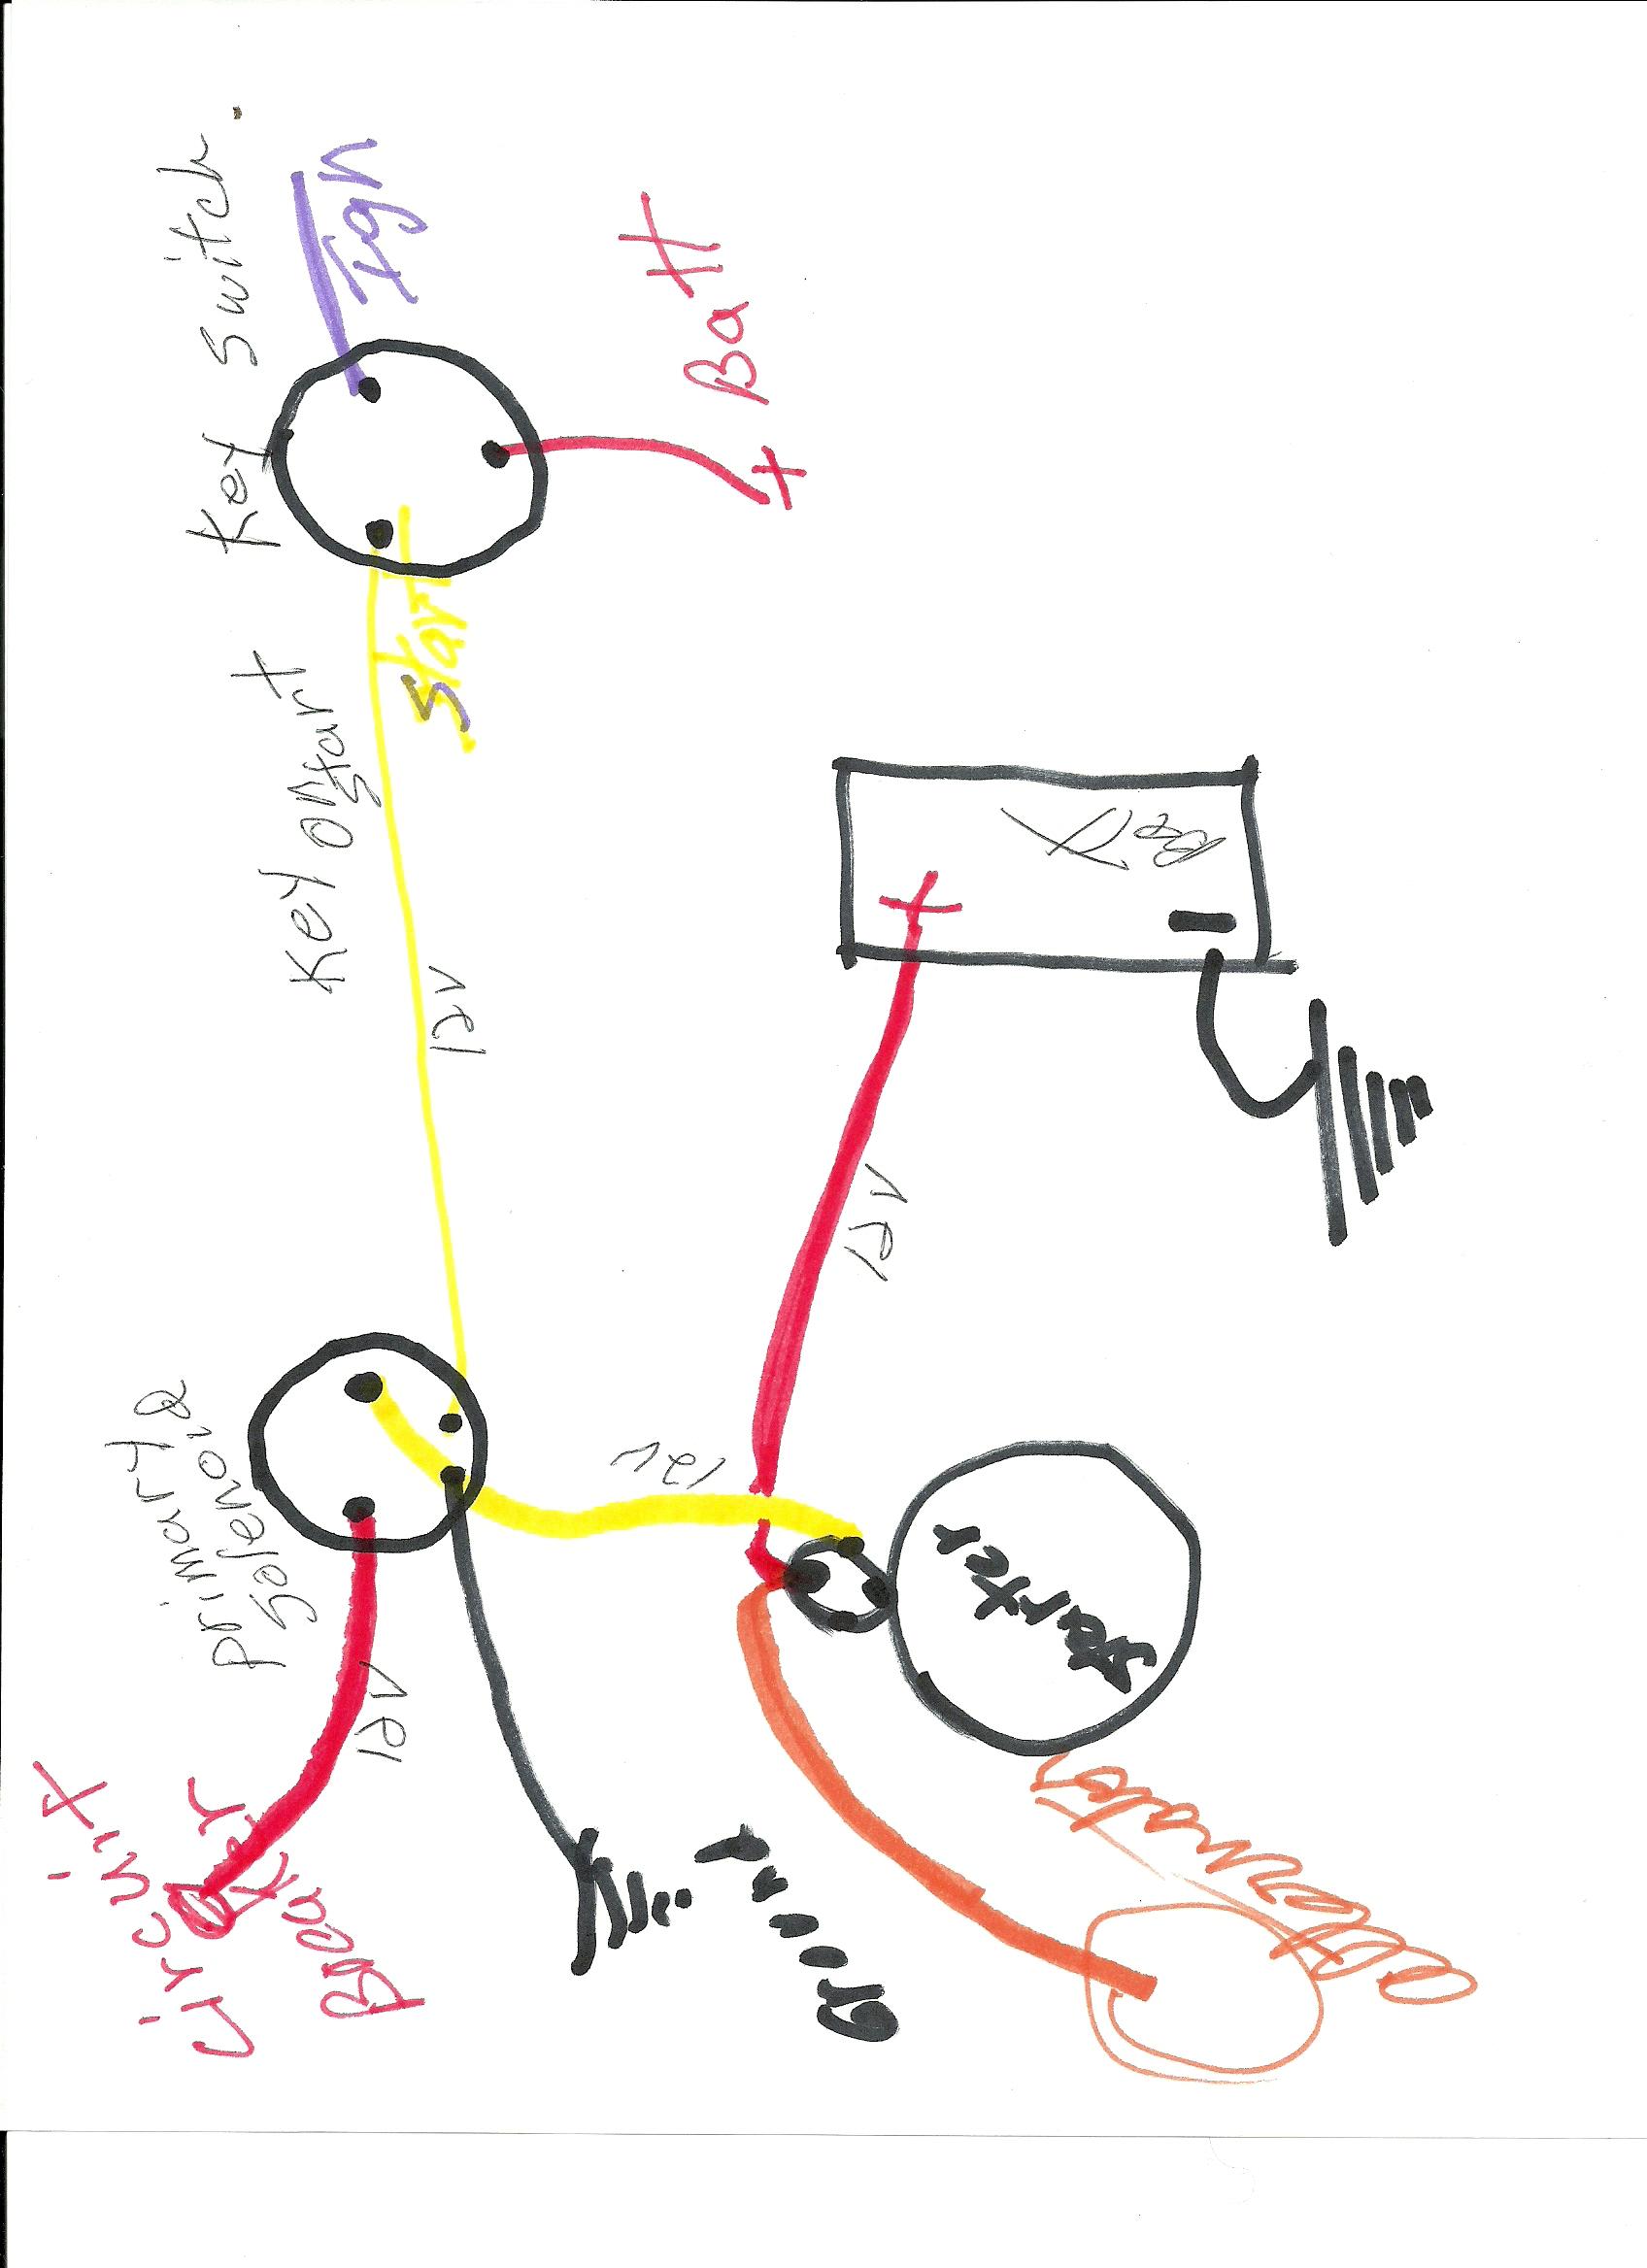 Groovy Mercruiser Starter Solenoid Wiring Diagram Wiring Diagram Wiring Cloud Faunaidewilluminateatxorg